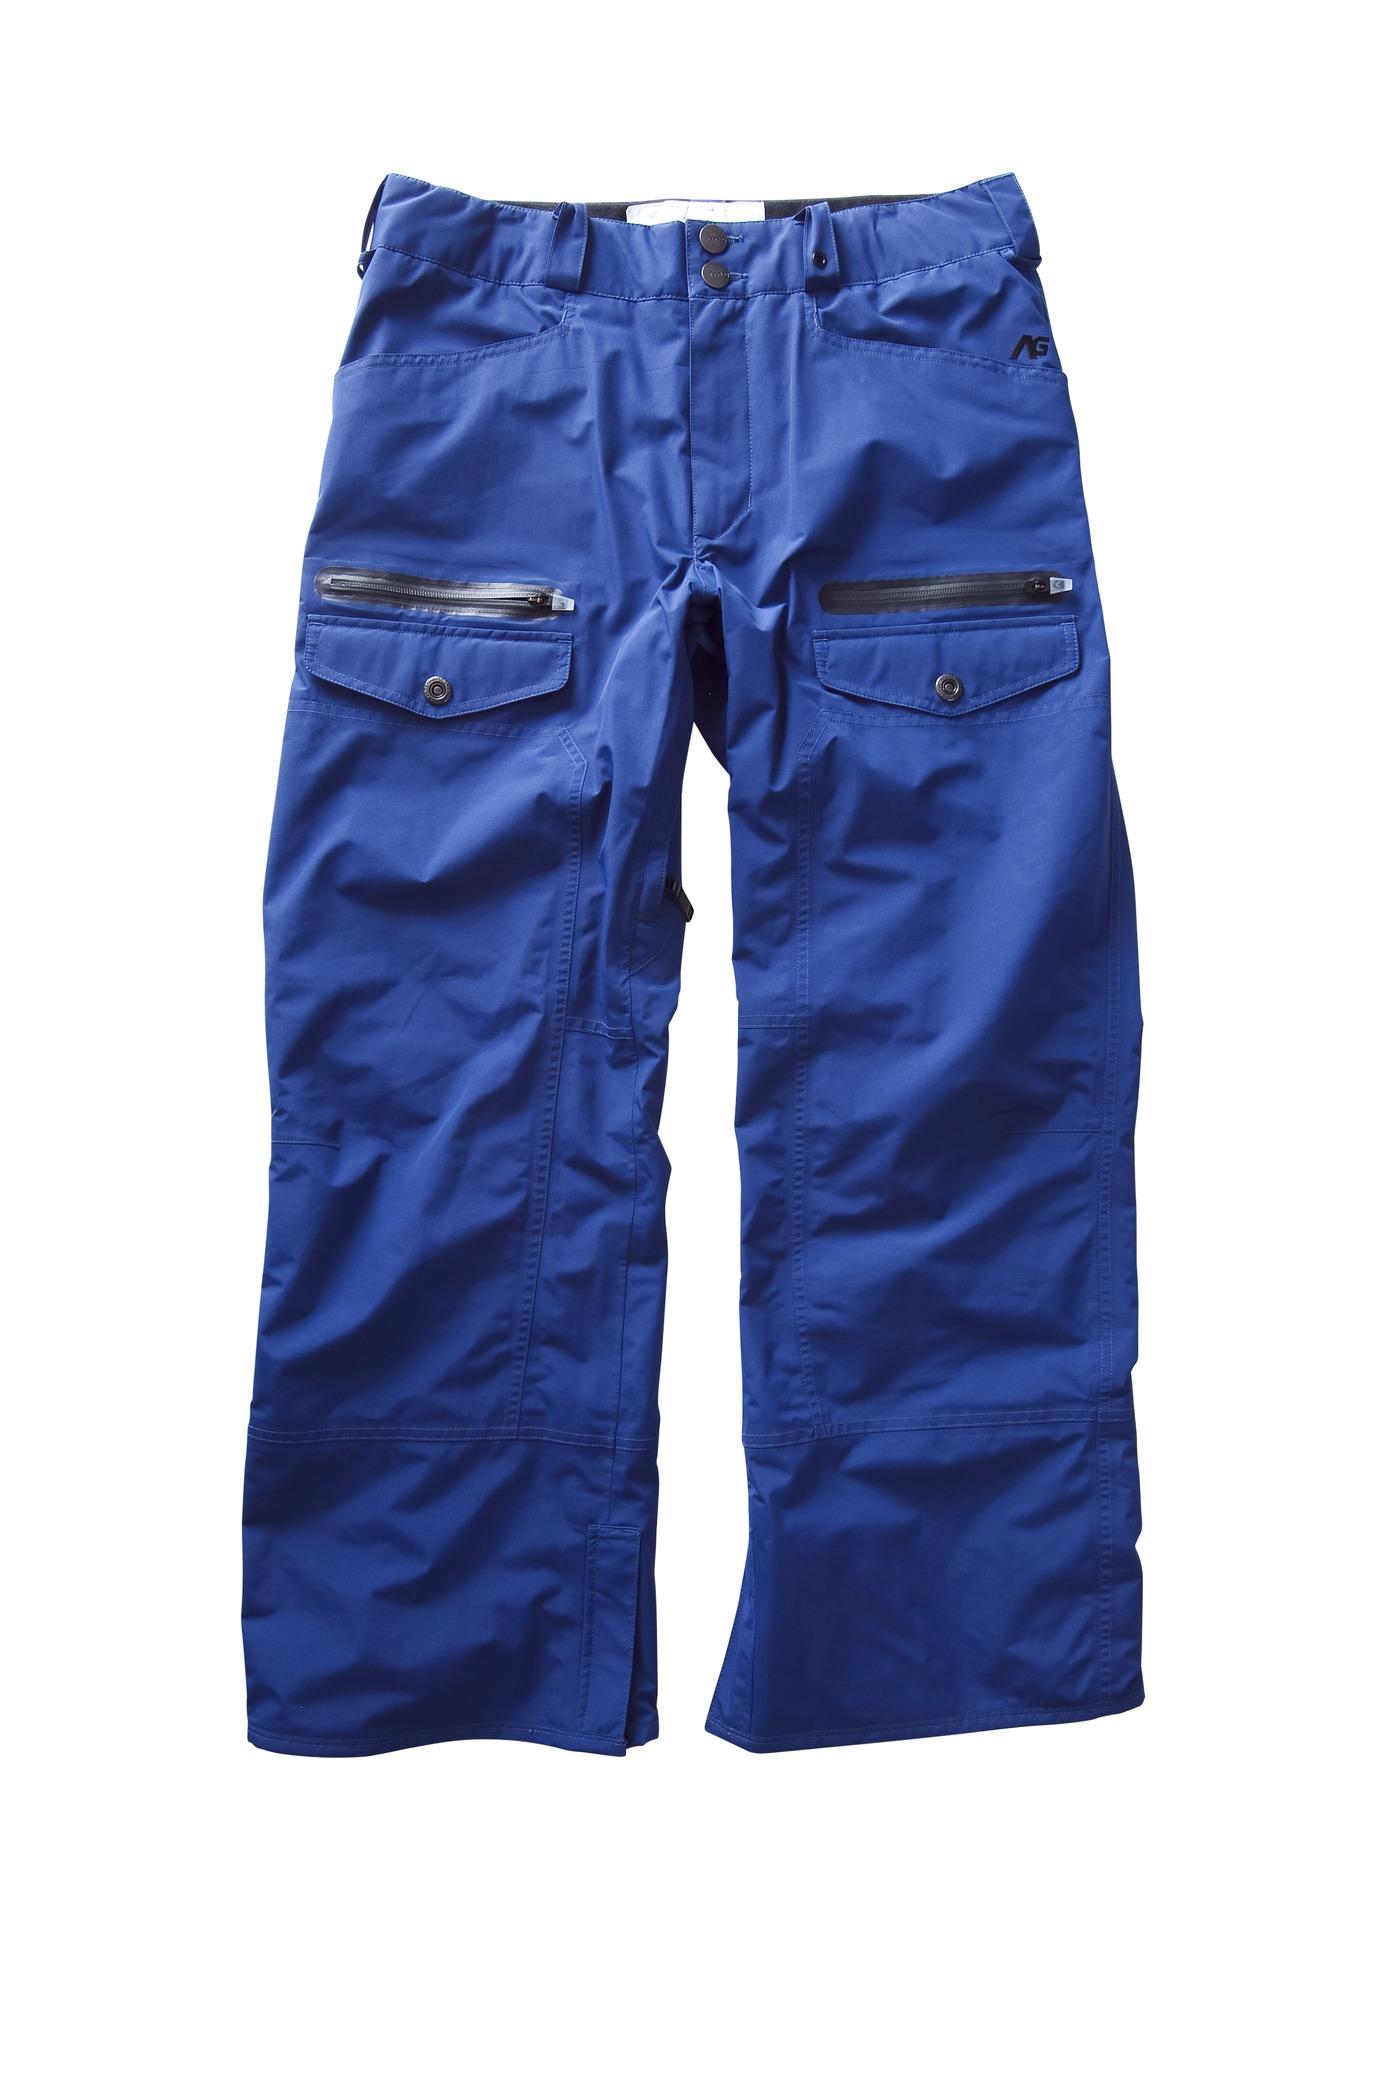 Spodnie Snowboardowe Analog Deploy (River Blue)